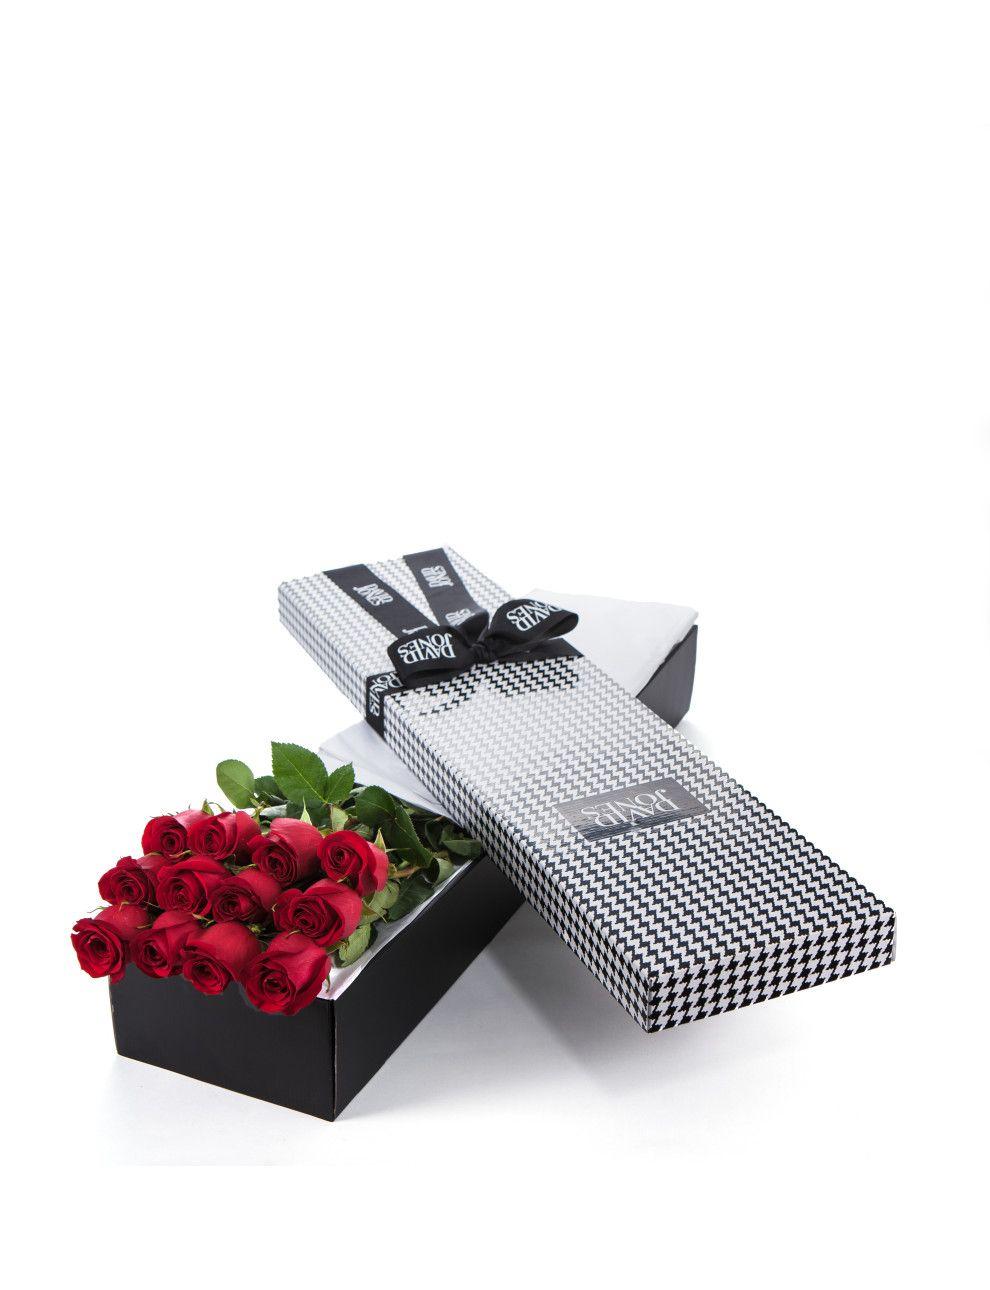 David Jones Kitchen Appliances 12 Red Premium Long Stem Roses David Jones 100 Free Delivery